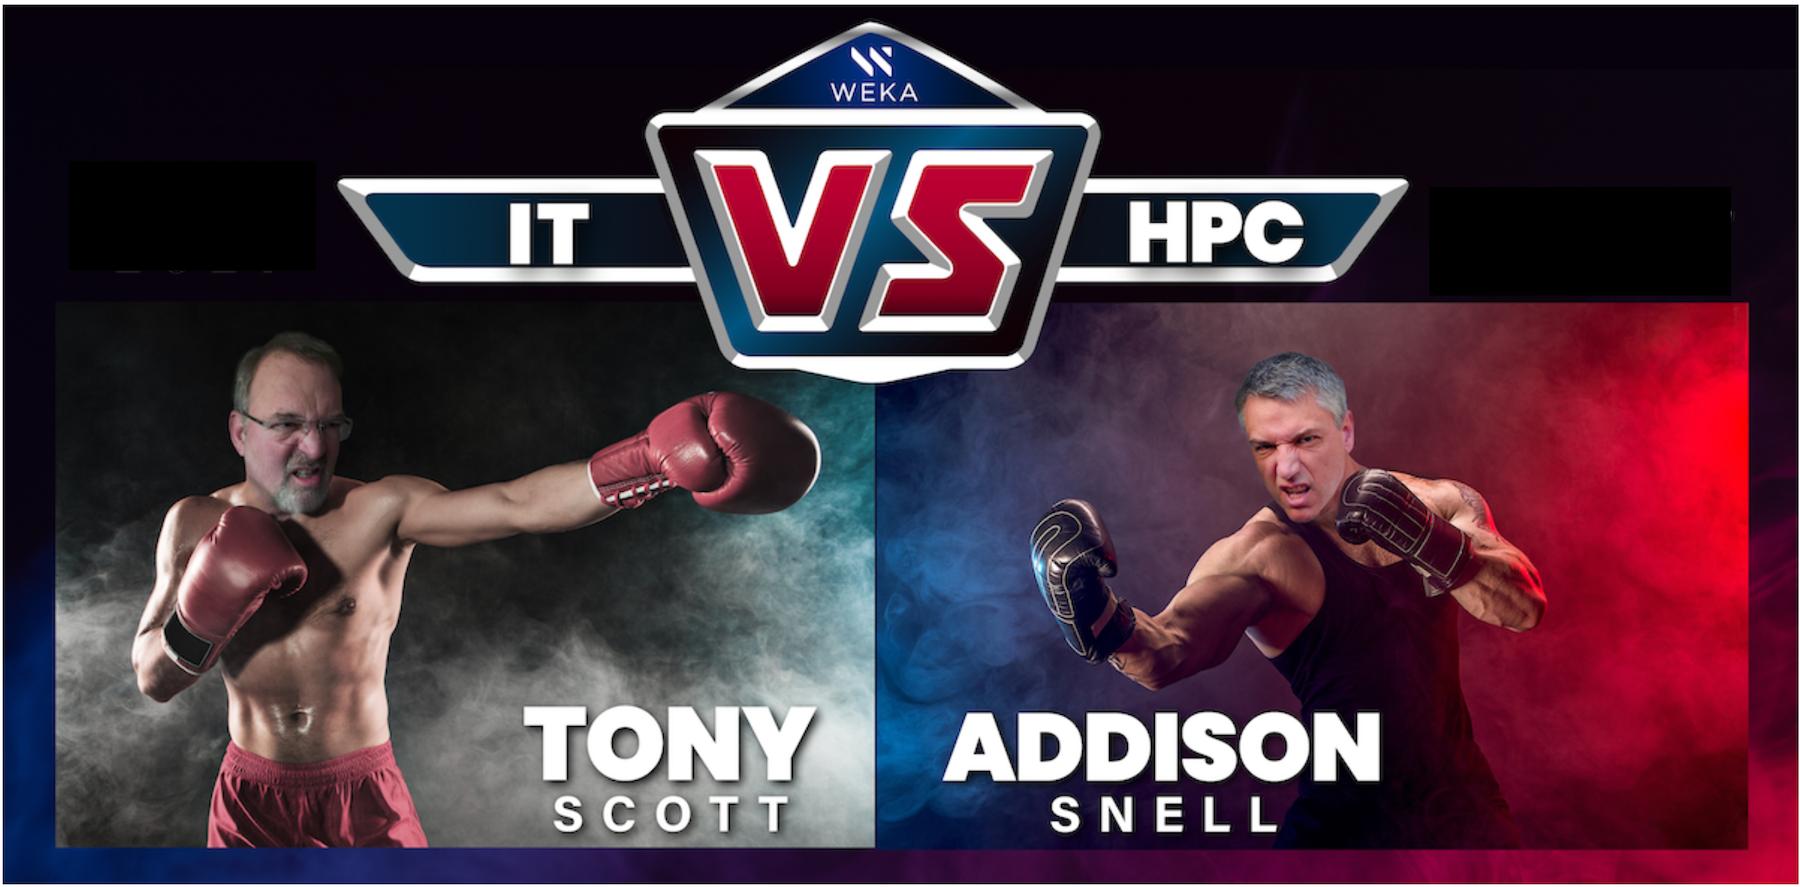 Tony Scott vs Addison Snell